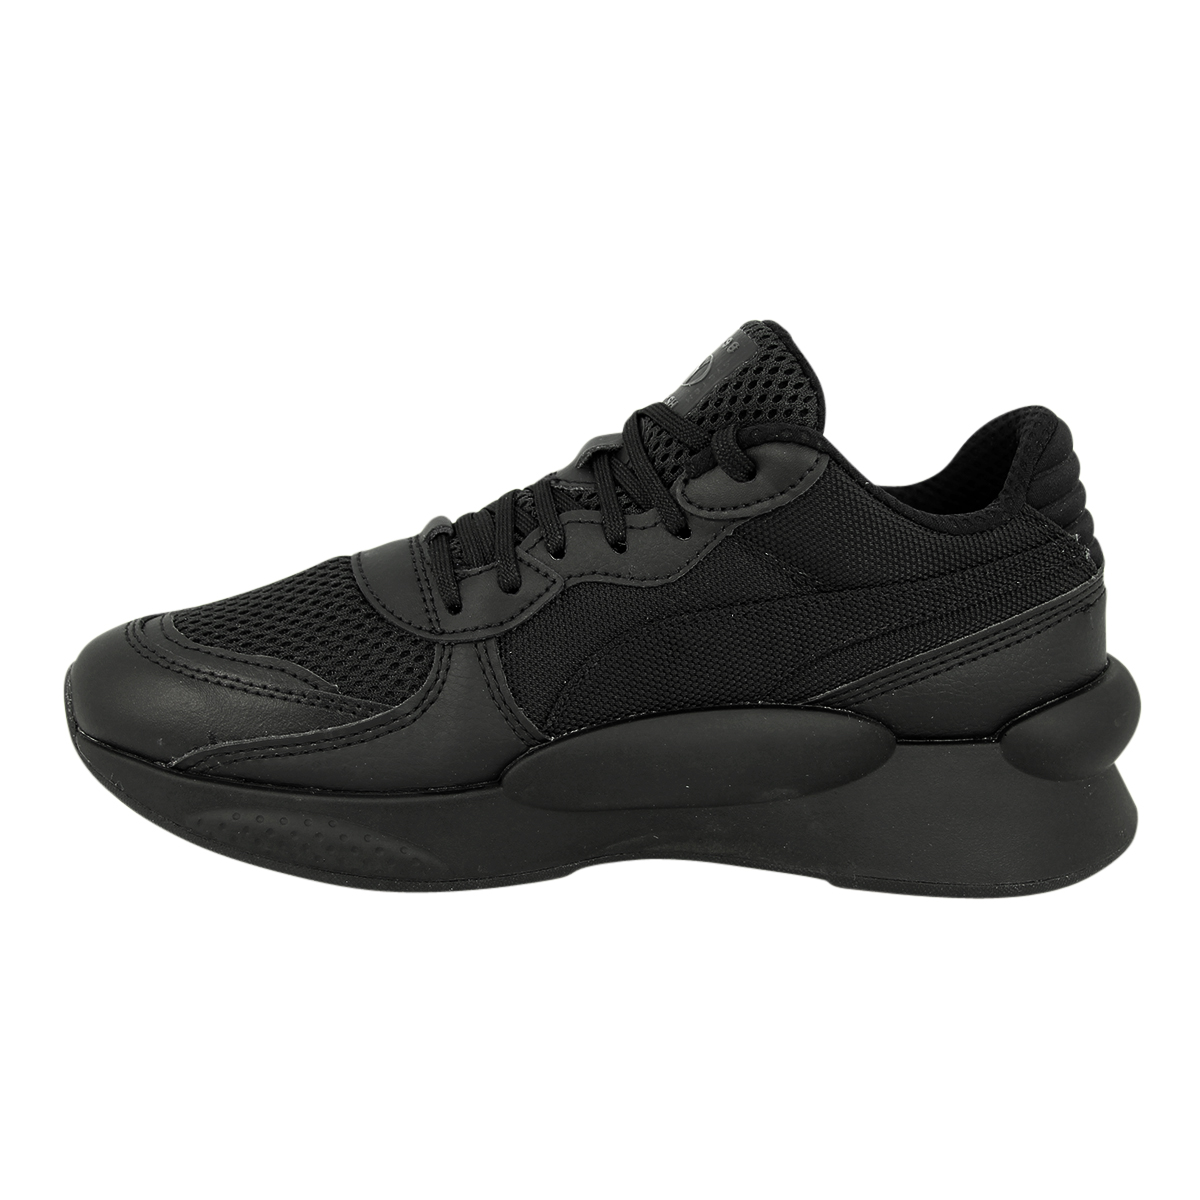 Baskets chaussures DIADORA HERITAGE CAMARO H SW CORE P//E2019 STAR BLANC List